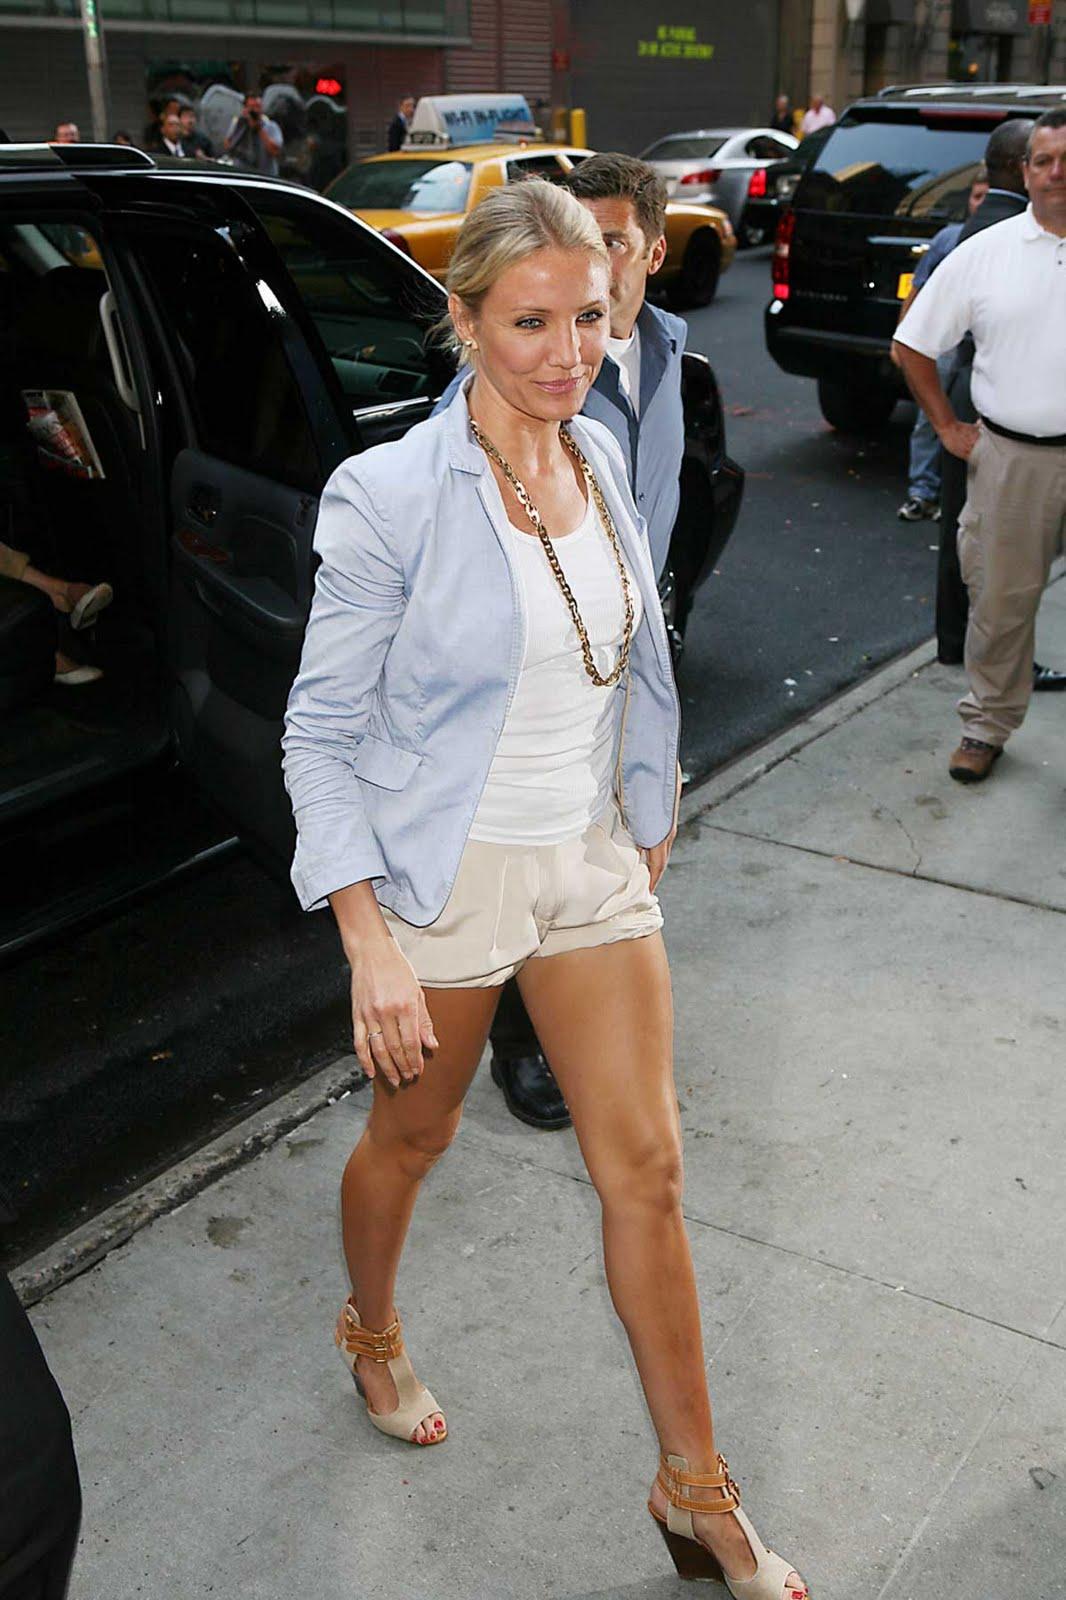 http://4.bp.blogspot.com/_6WjpEjfw51o/TCKF07ZE5tI/AAAAAAAAF3M/2LOHxFtpHPo/s1600/cameron_diaz_shorts_3.jpg